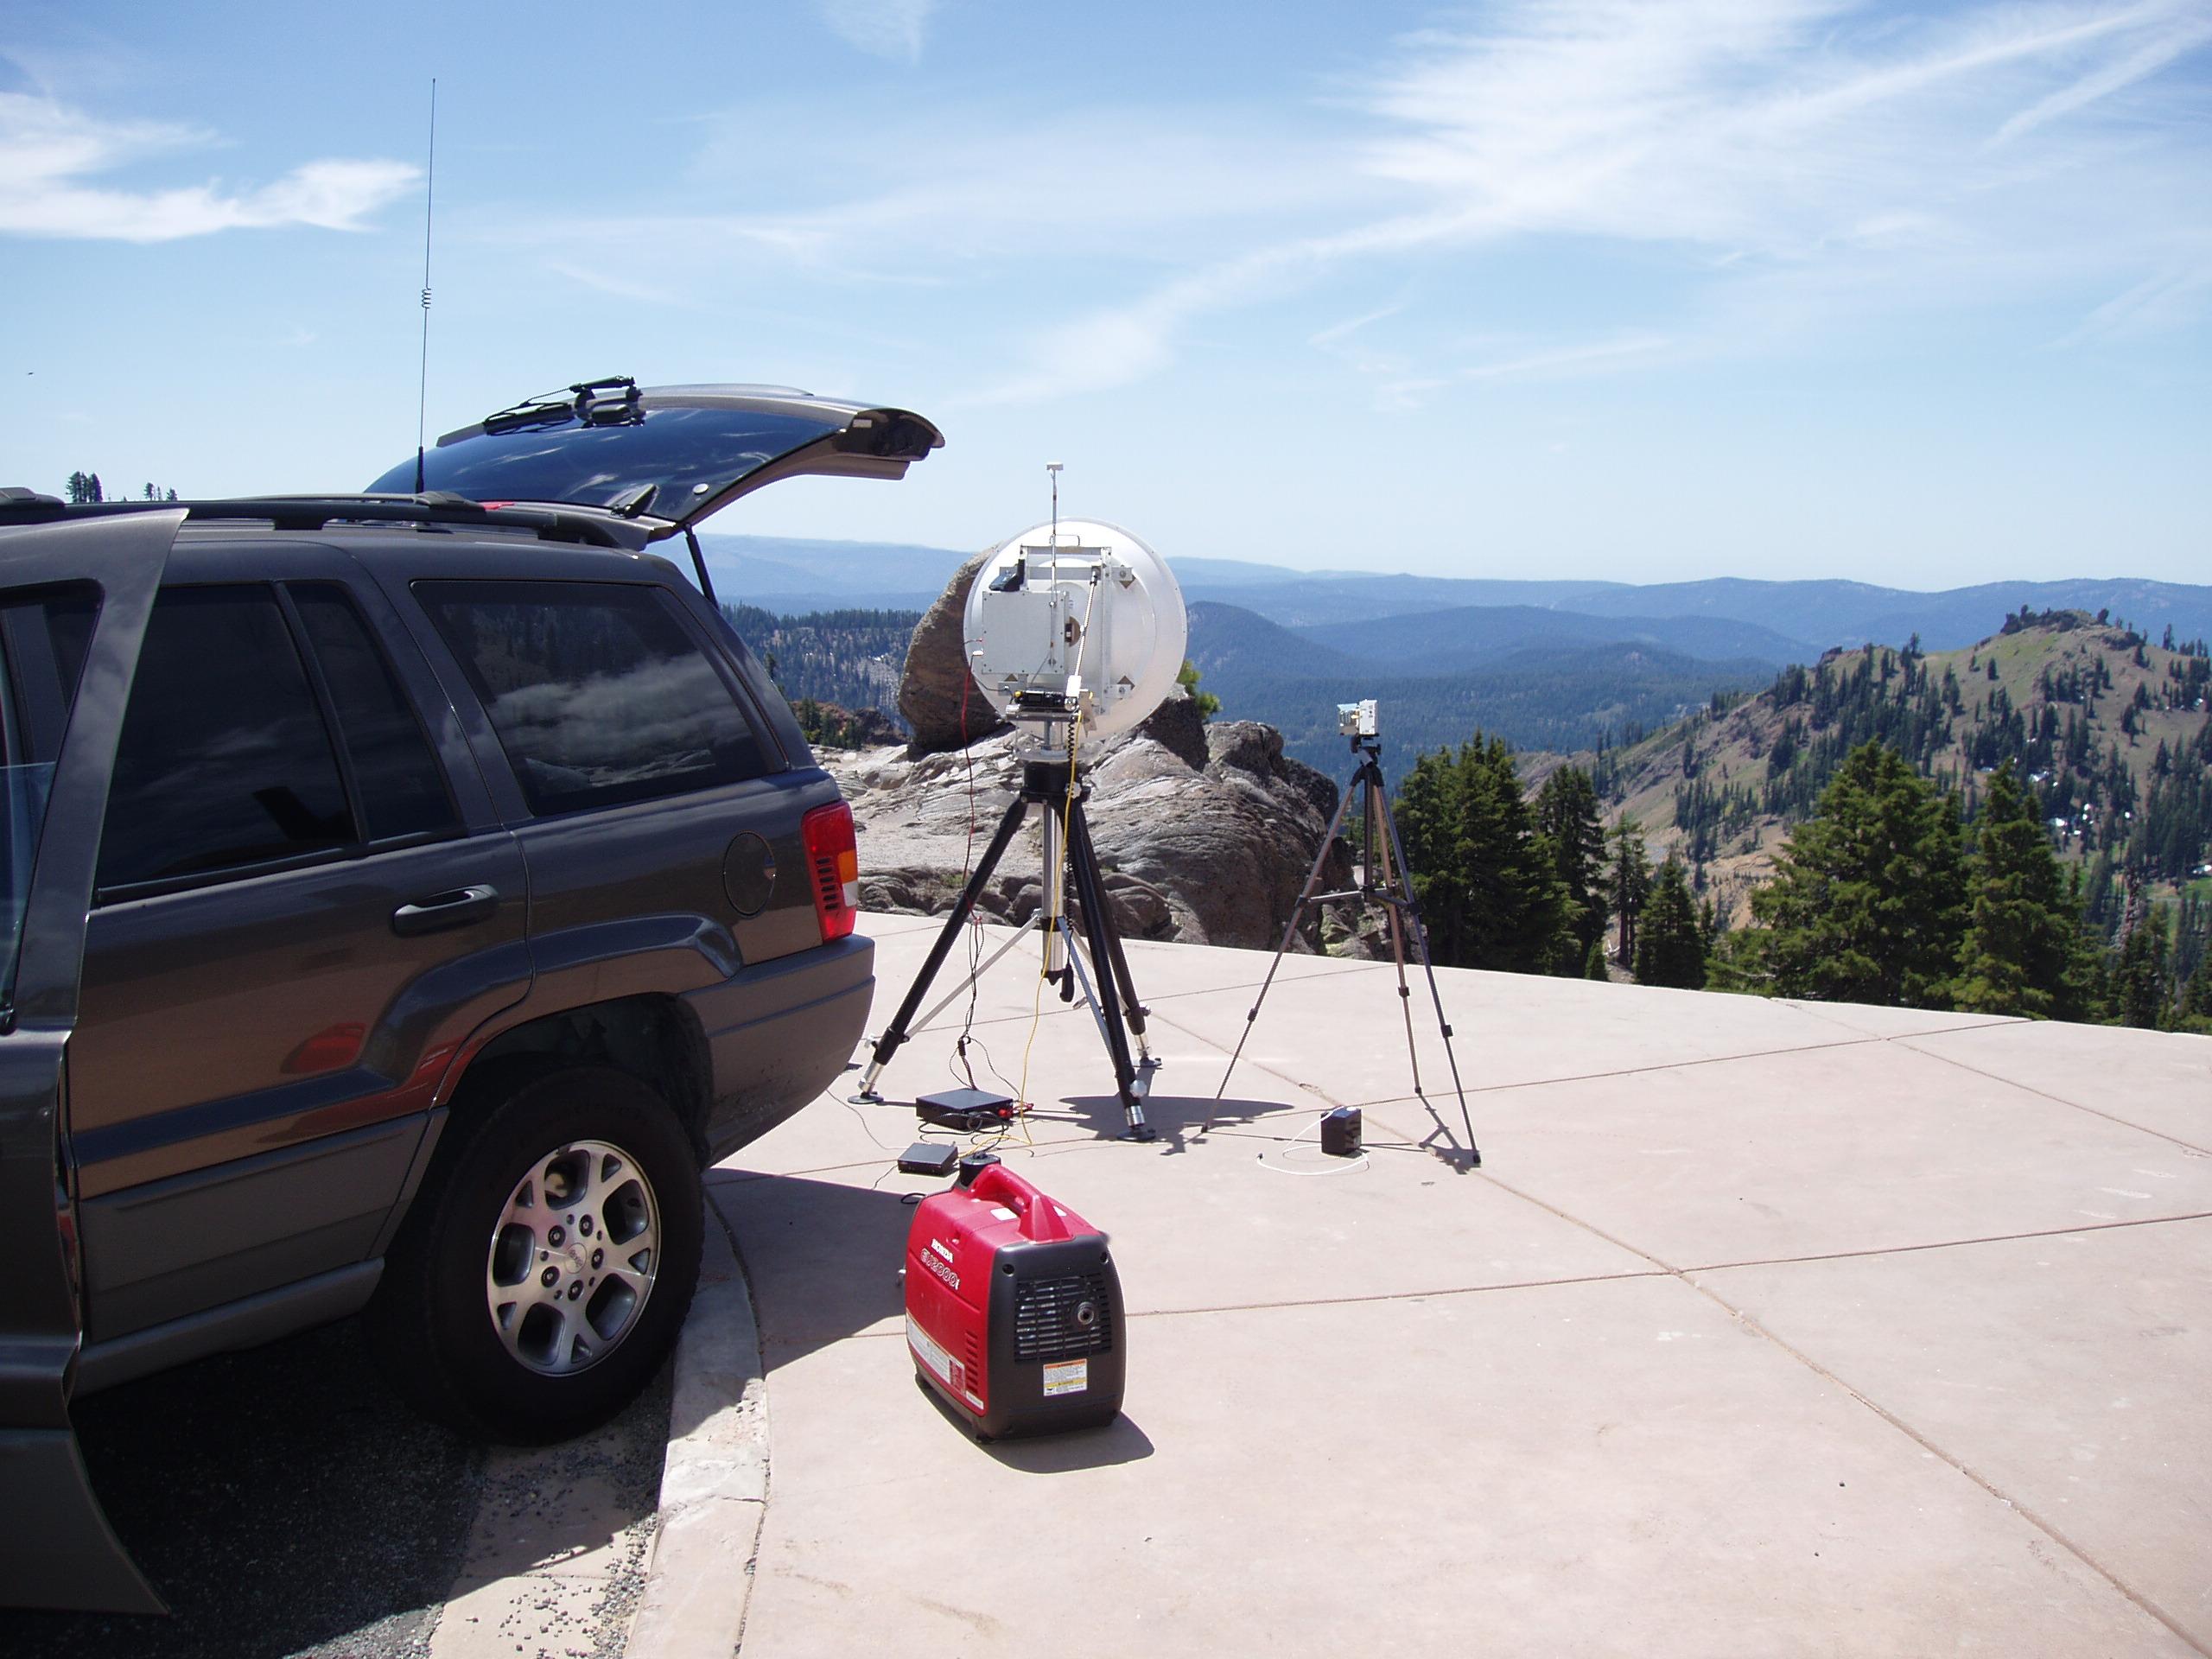 AD6IW Goram World Record 76 GHz